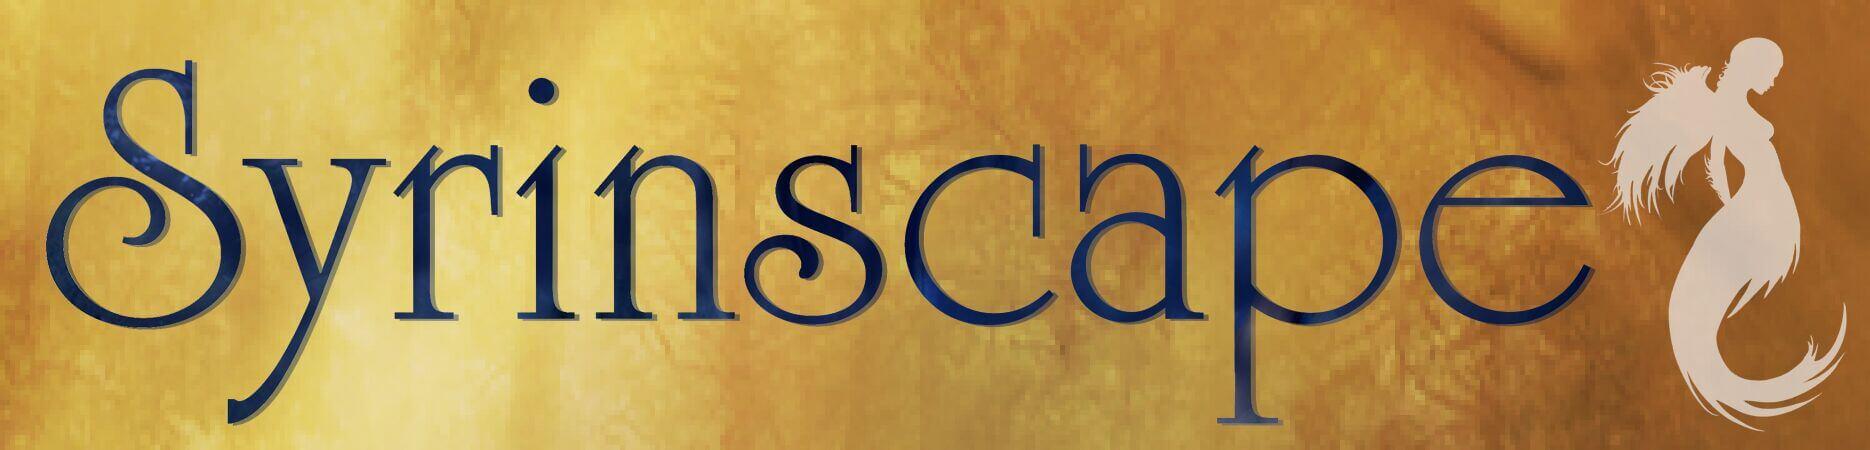 Syrinscape Logo.jpeg